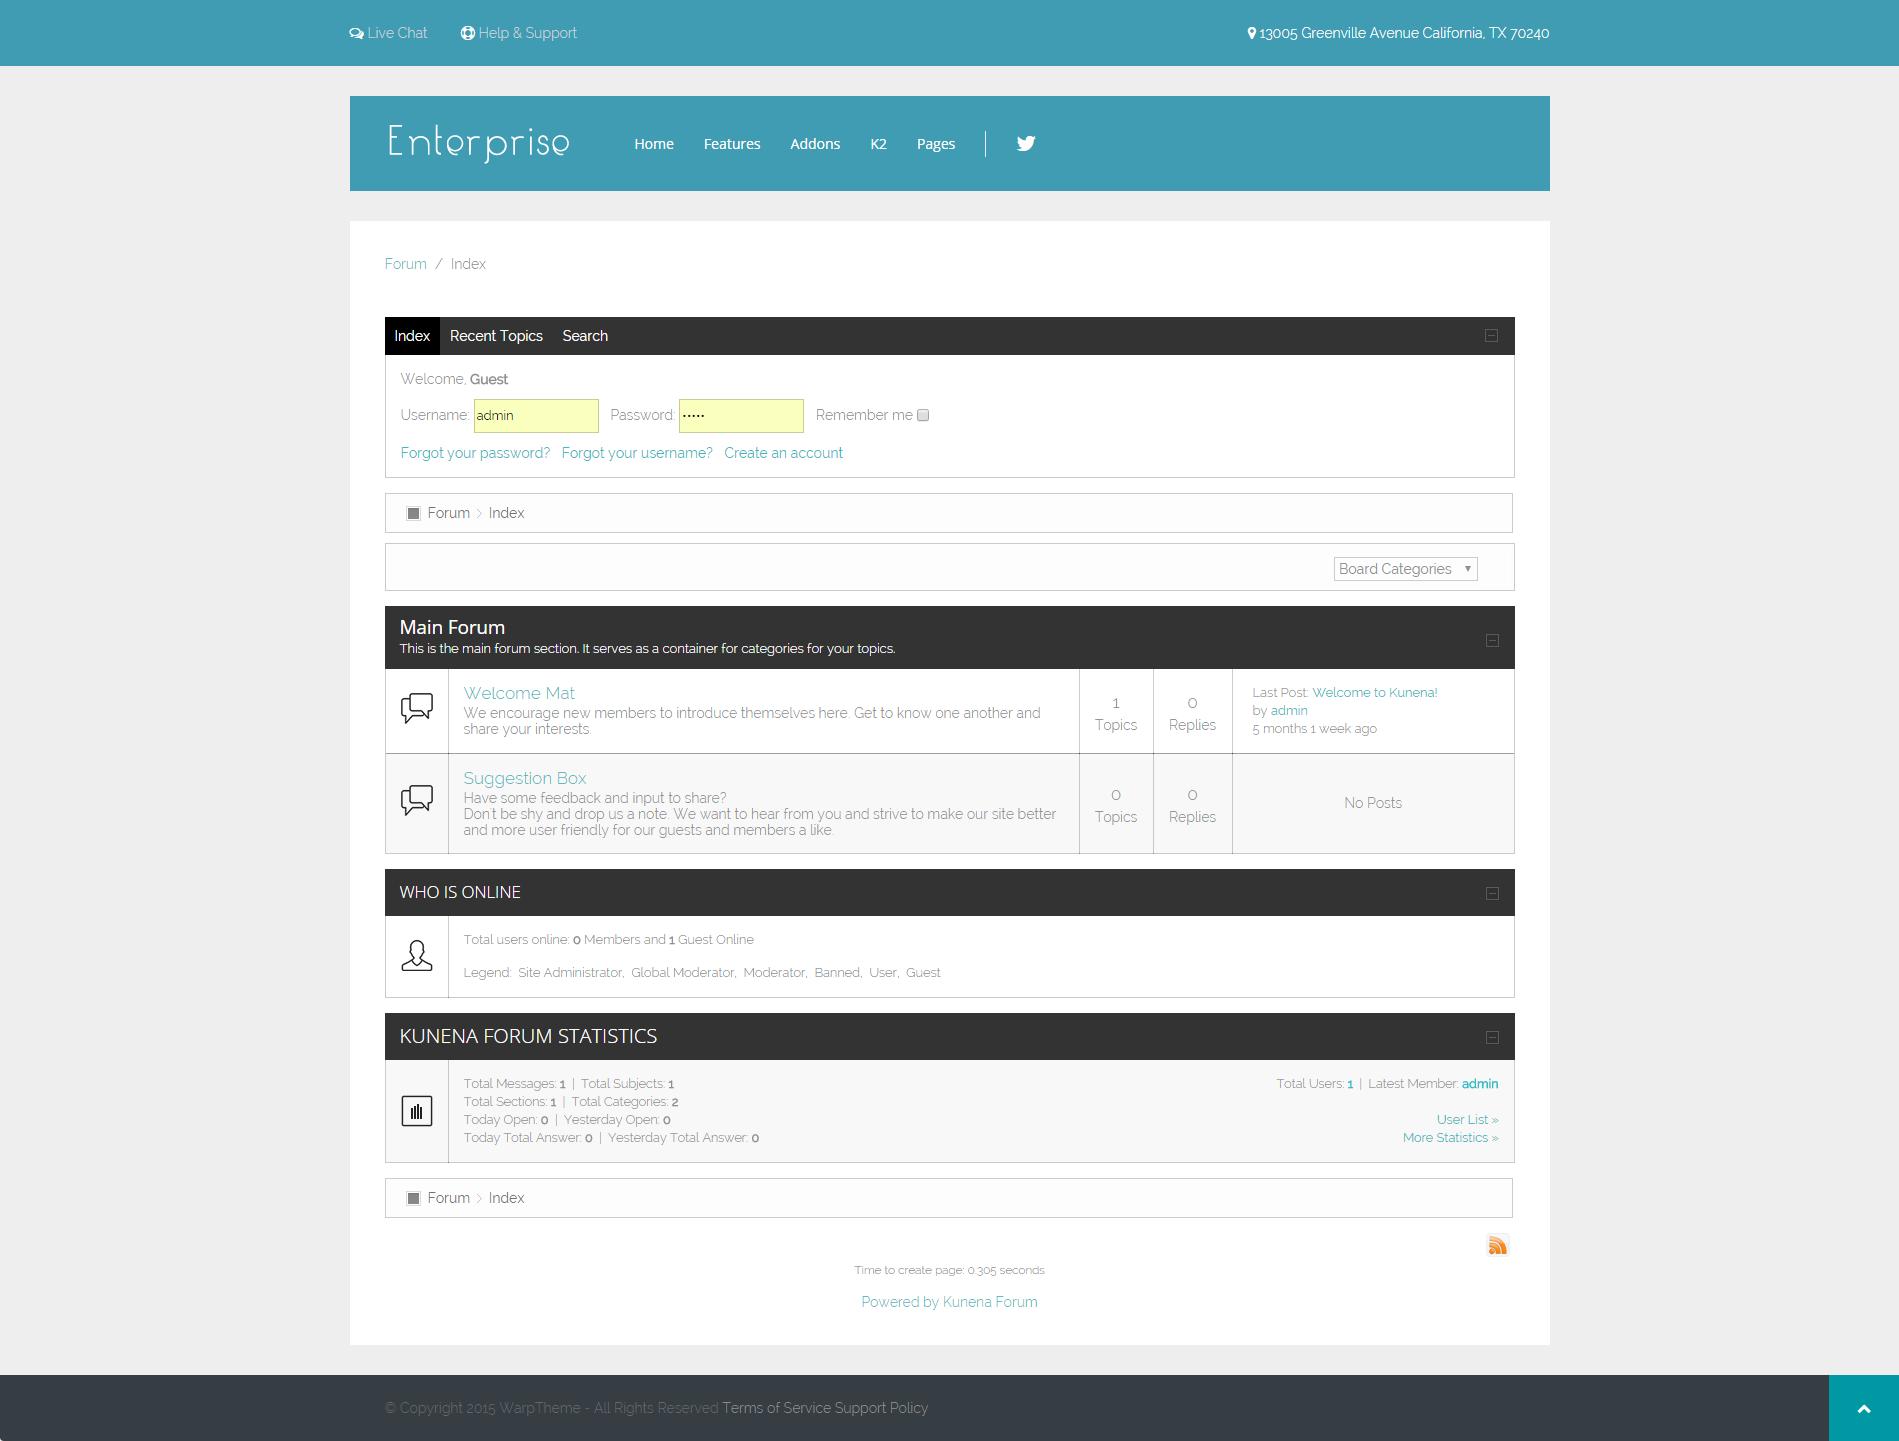 Enterprise Kunena Forum Page